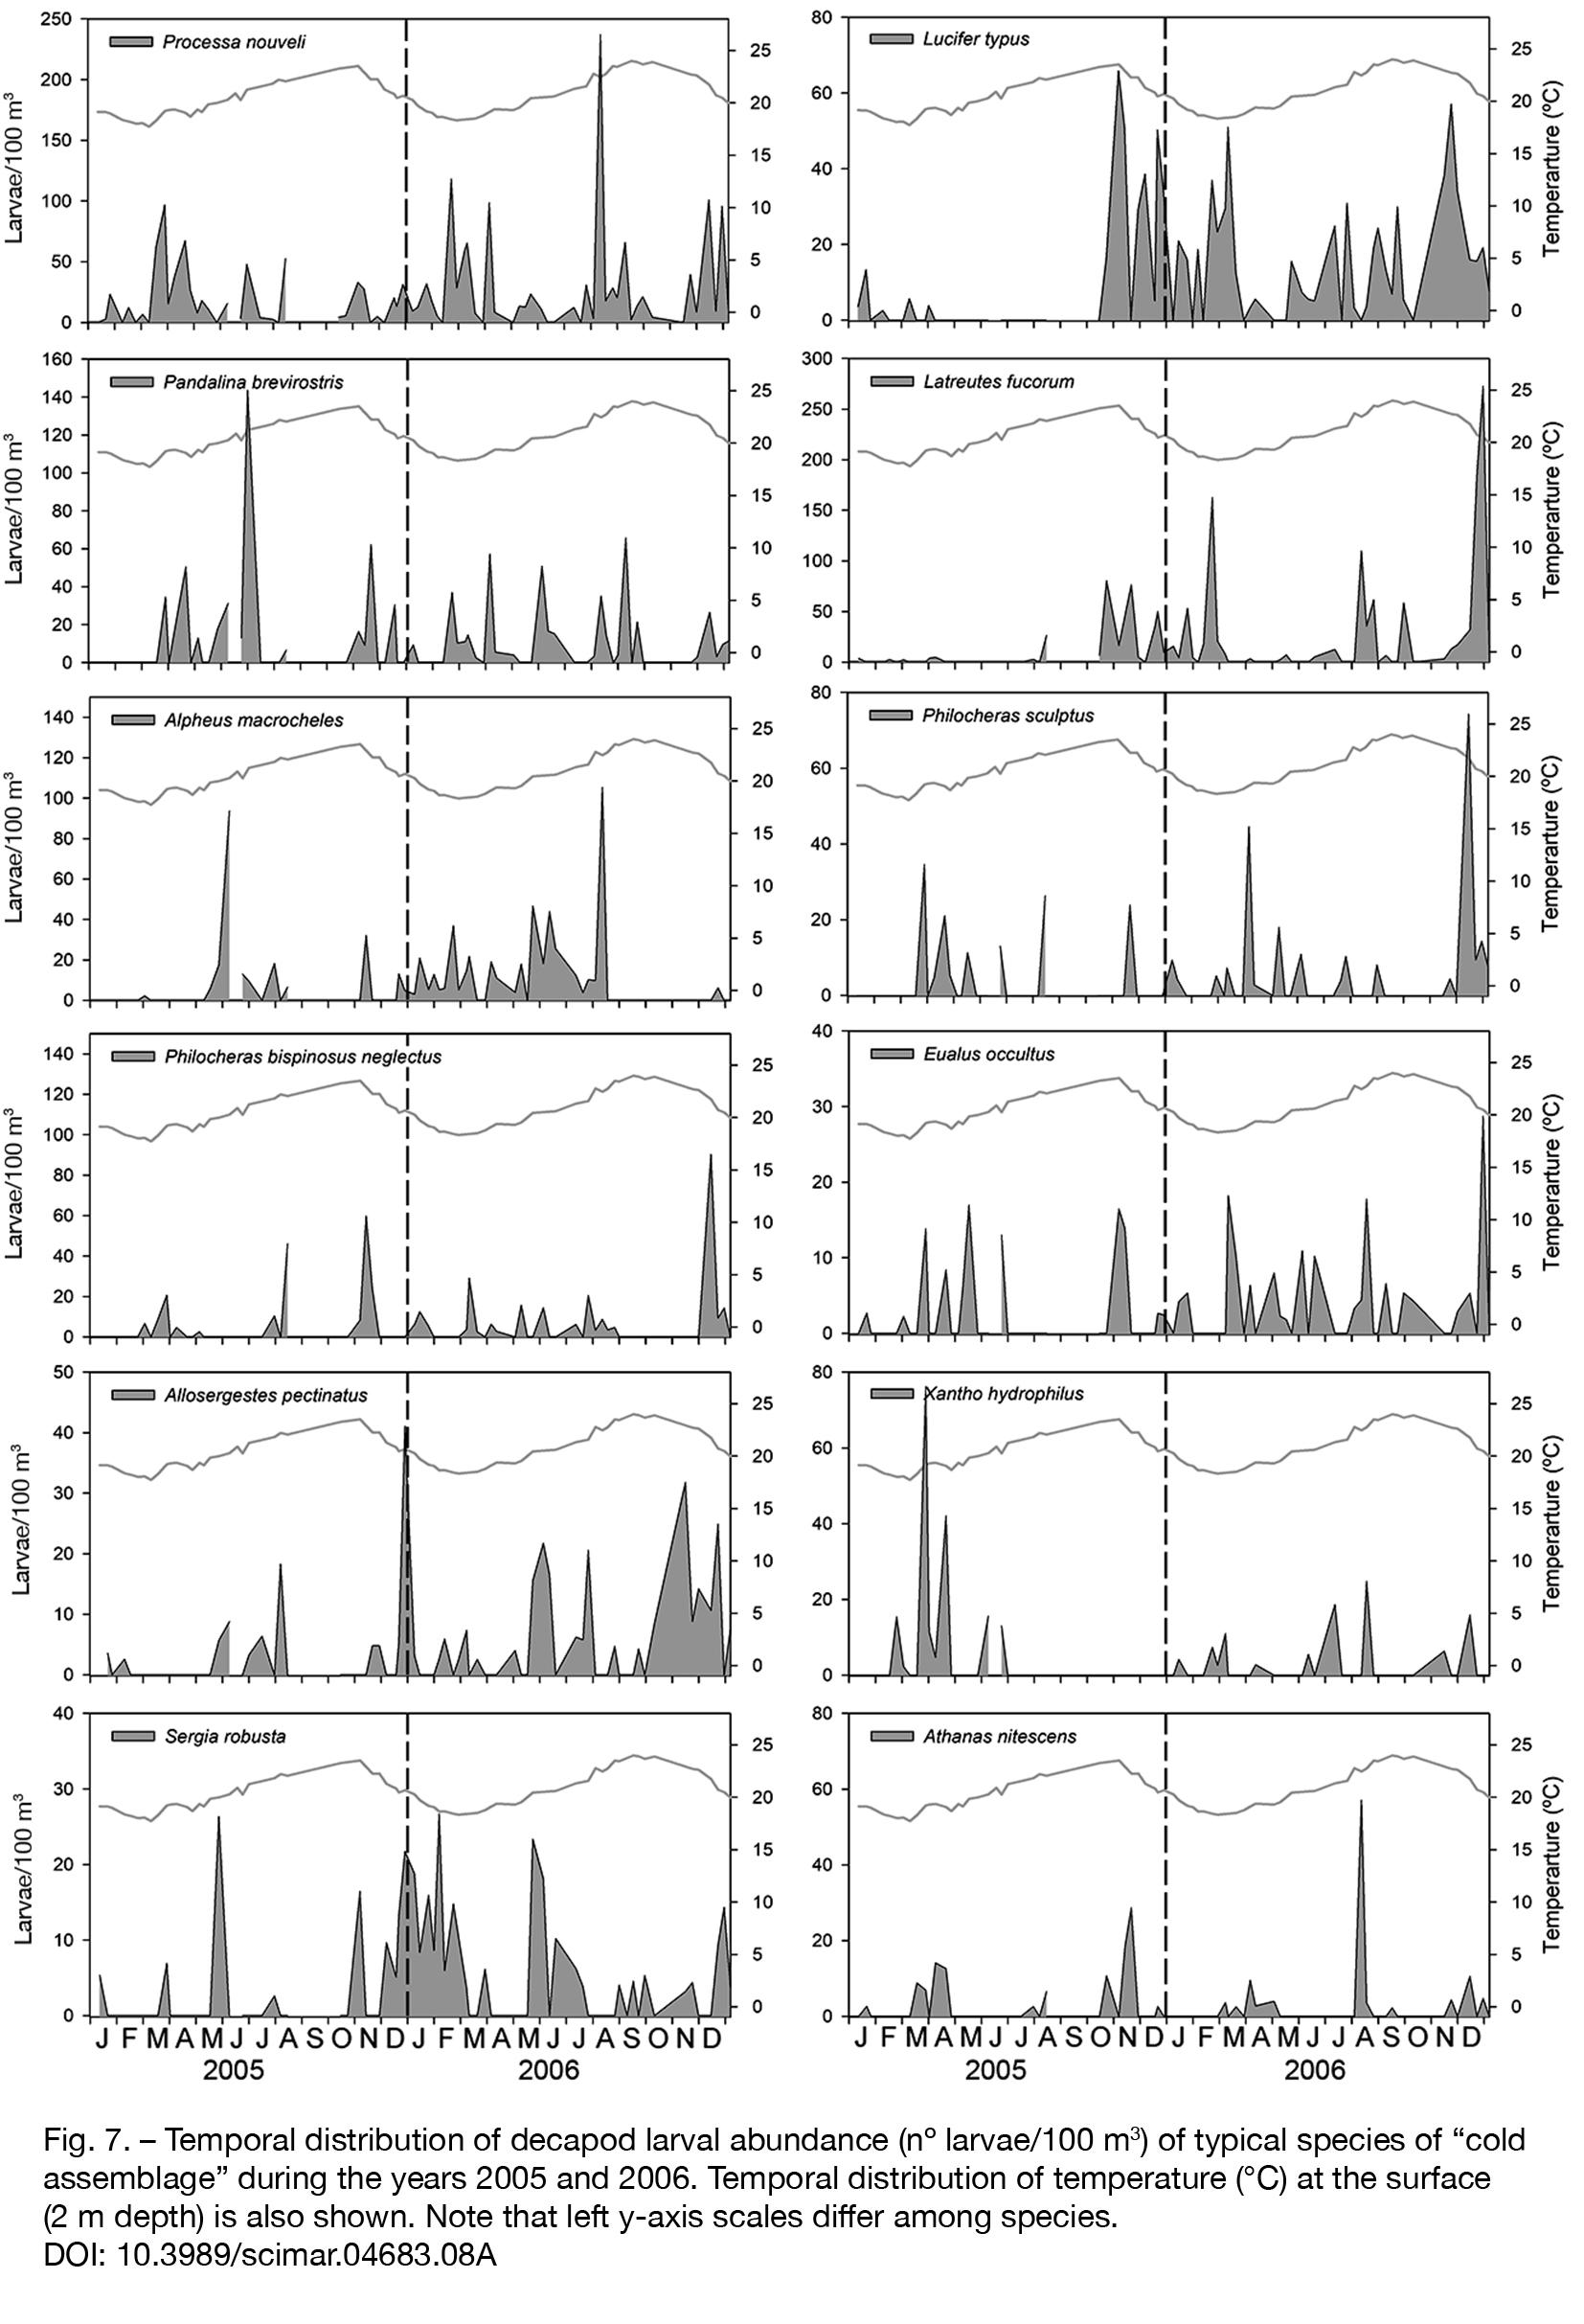 Seasonality of planktonic crustacean decapod larvae in the